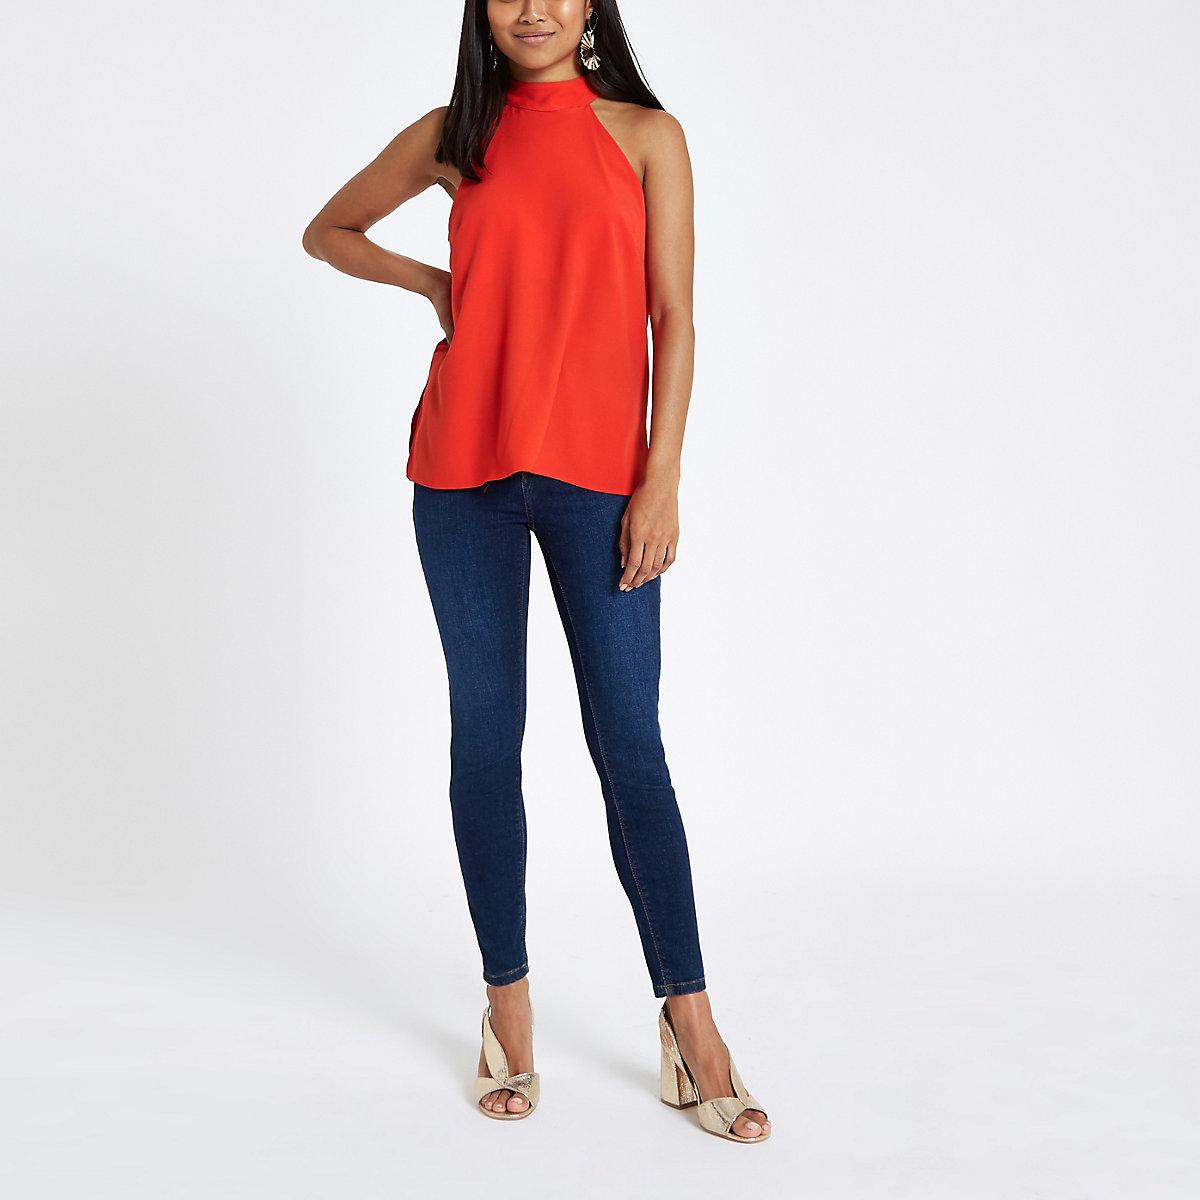 Petite red halter neck sleeveless top